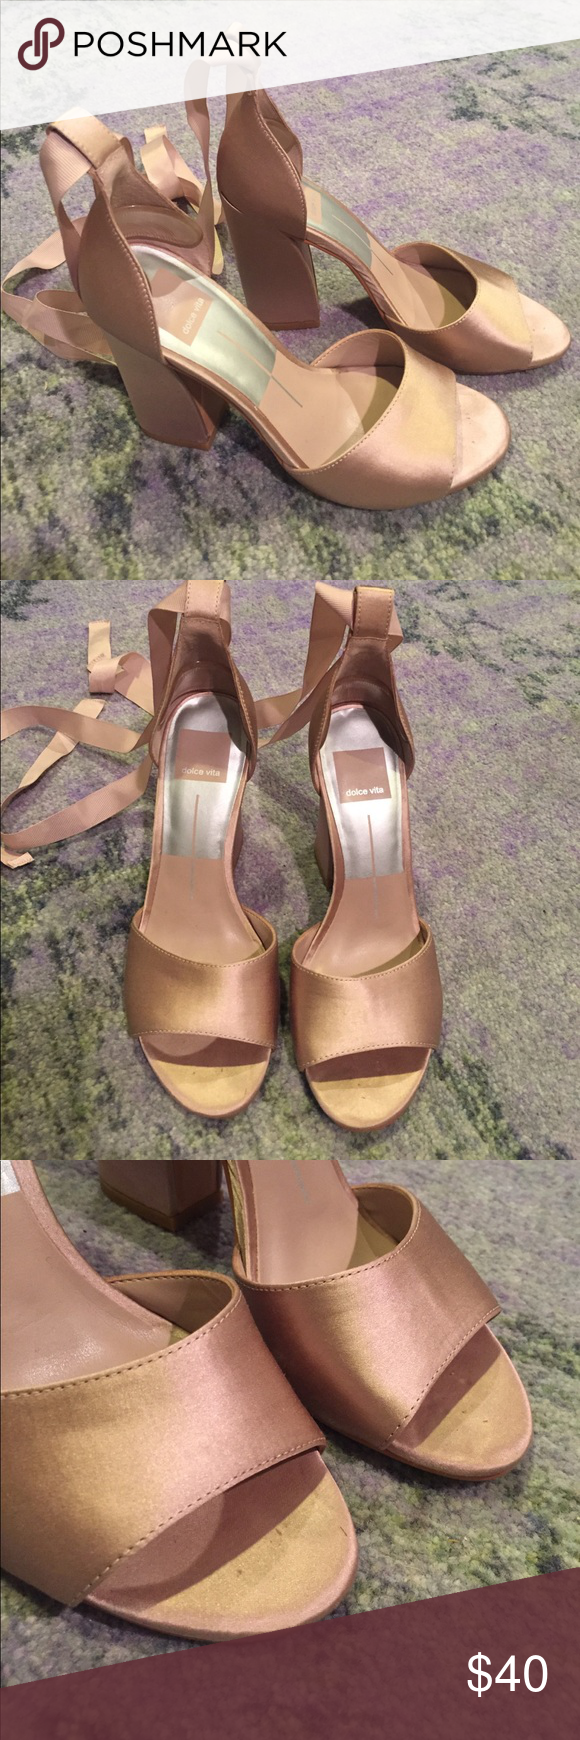 3fbc6cbbc7 Dolce Vita Harvey Satin Heel - Rose, Size 6 Rose colored satin block heel  sandal